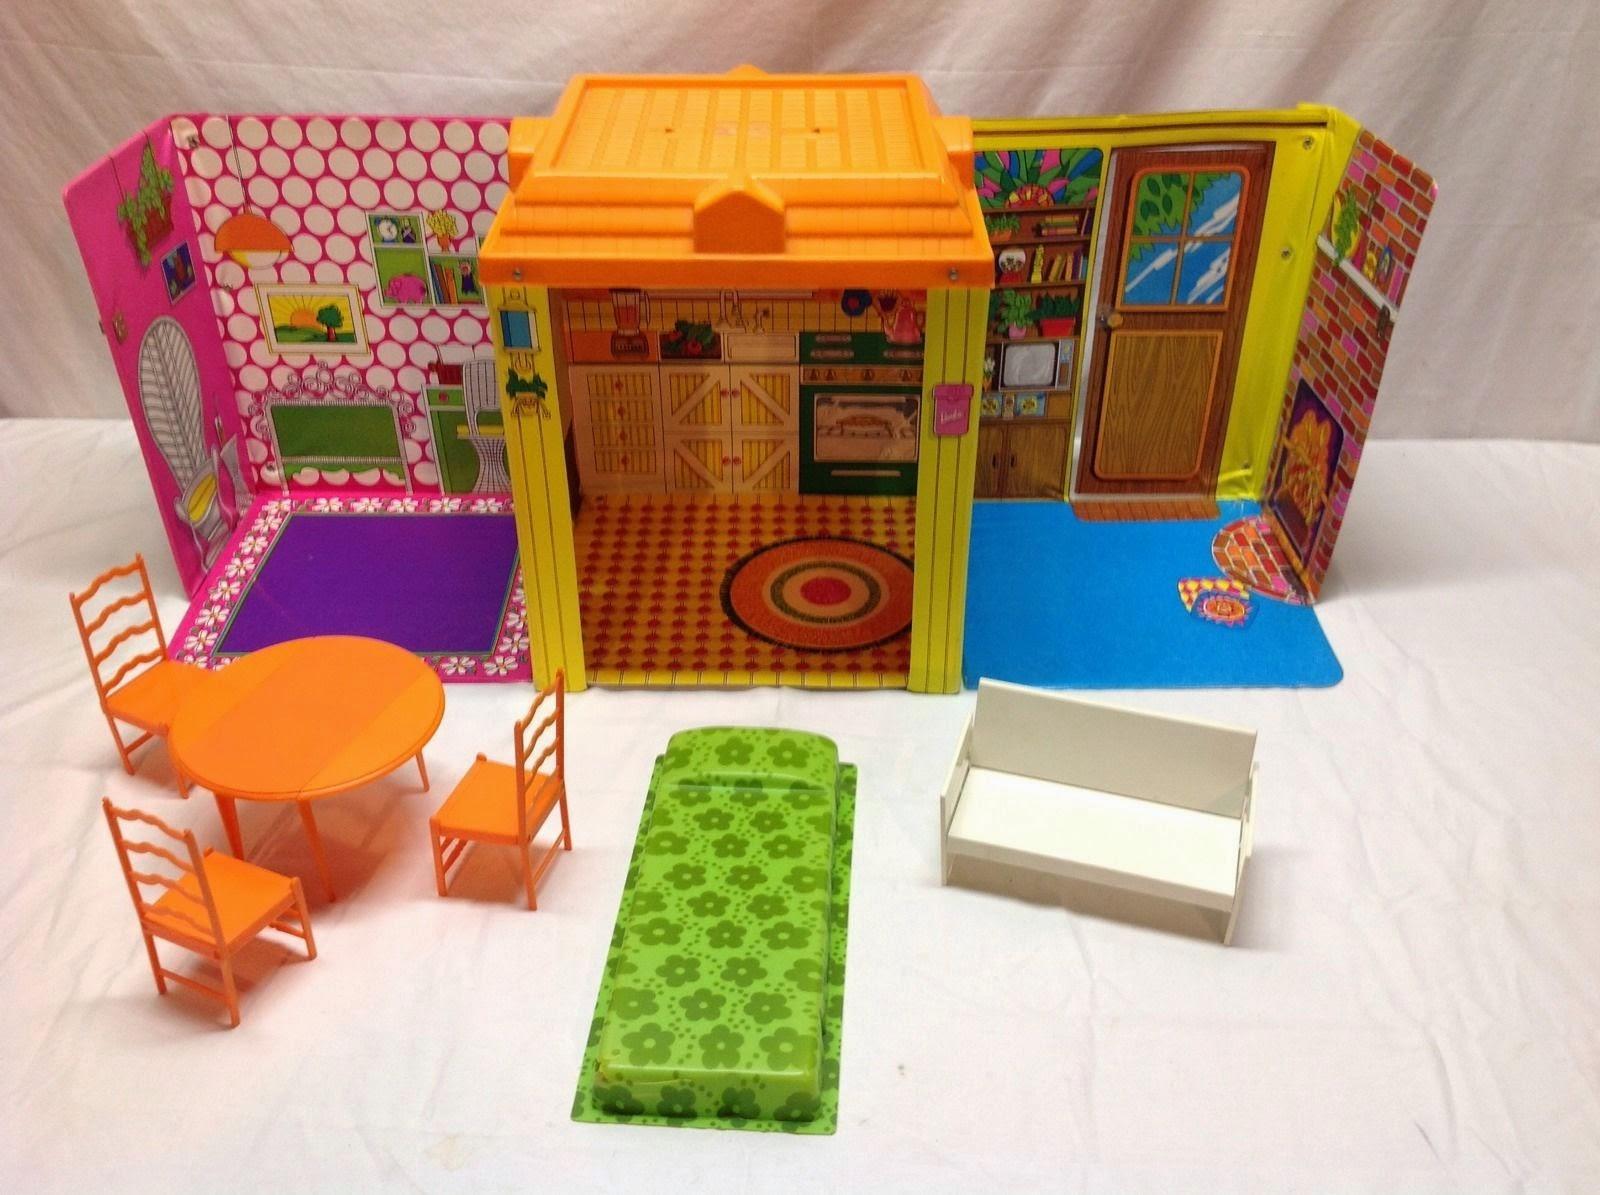 Vasca Da Bagno Barbie Anni 70 : Barbie anni giochi per bambini kijiji annunci di ebay